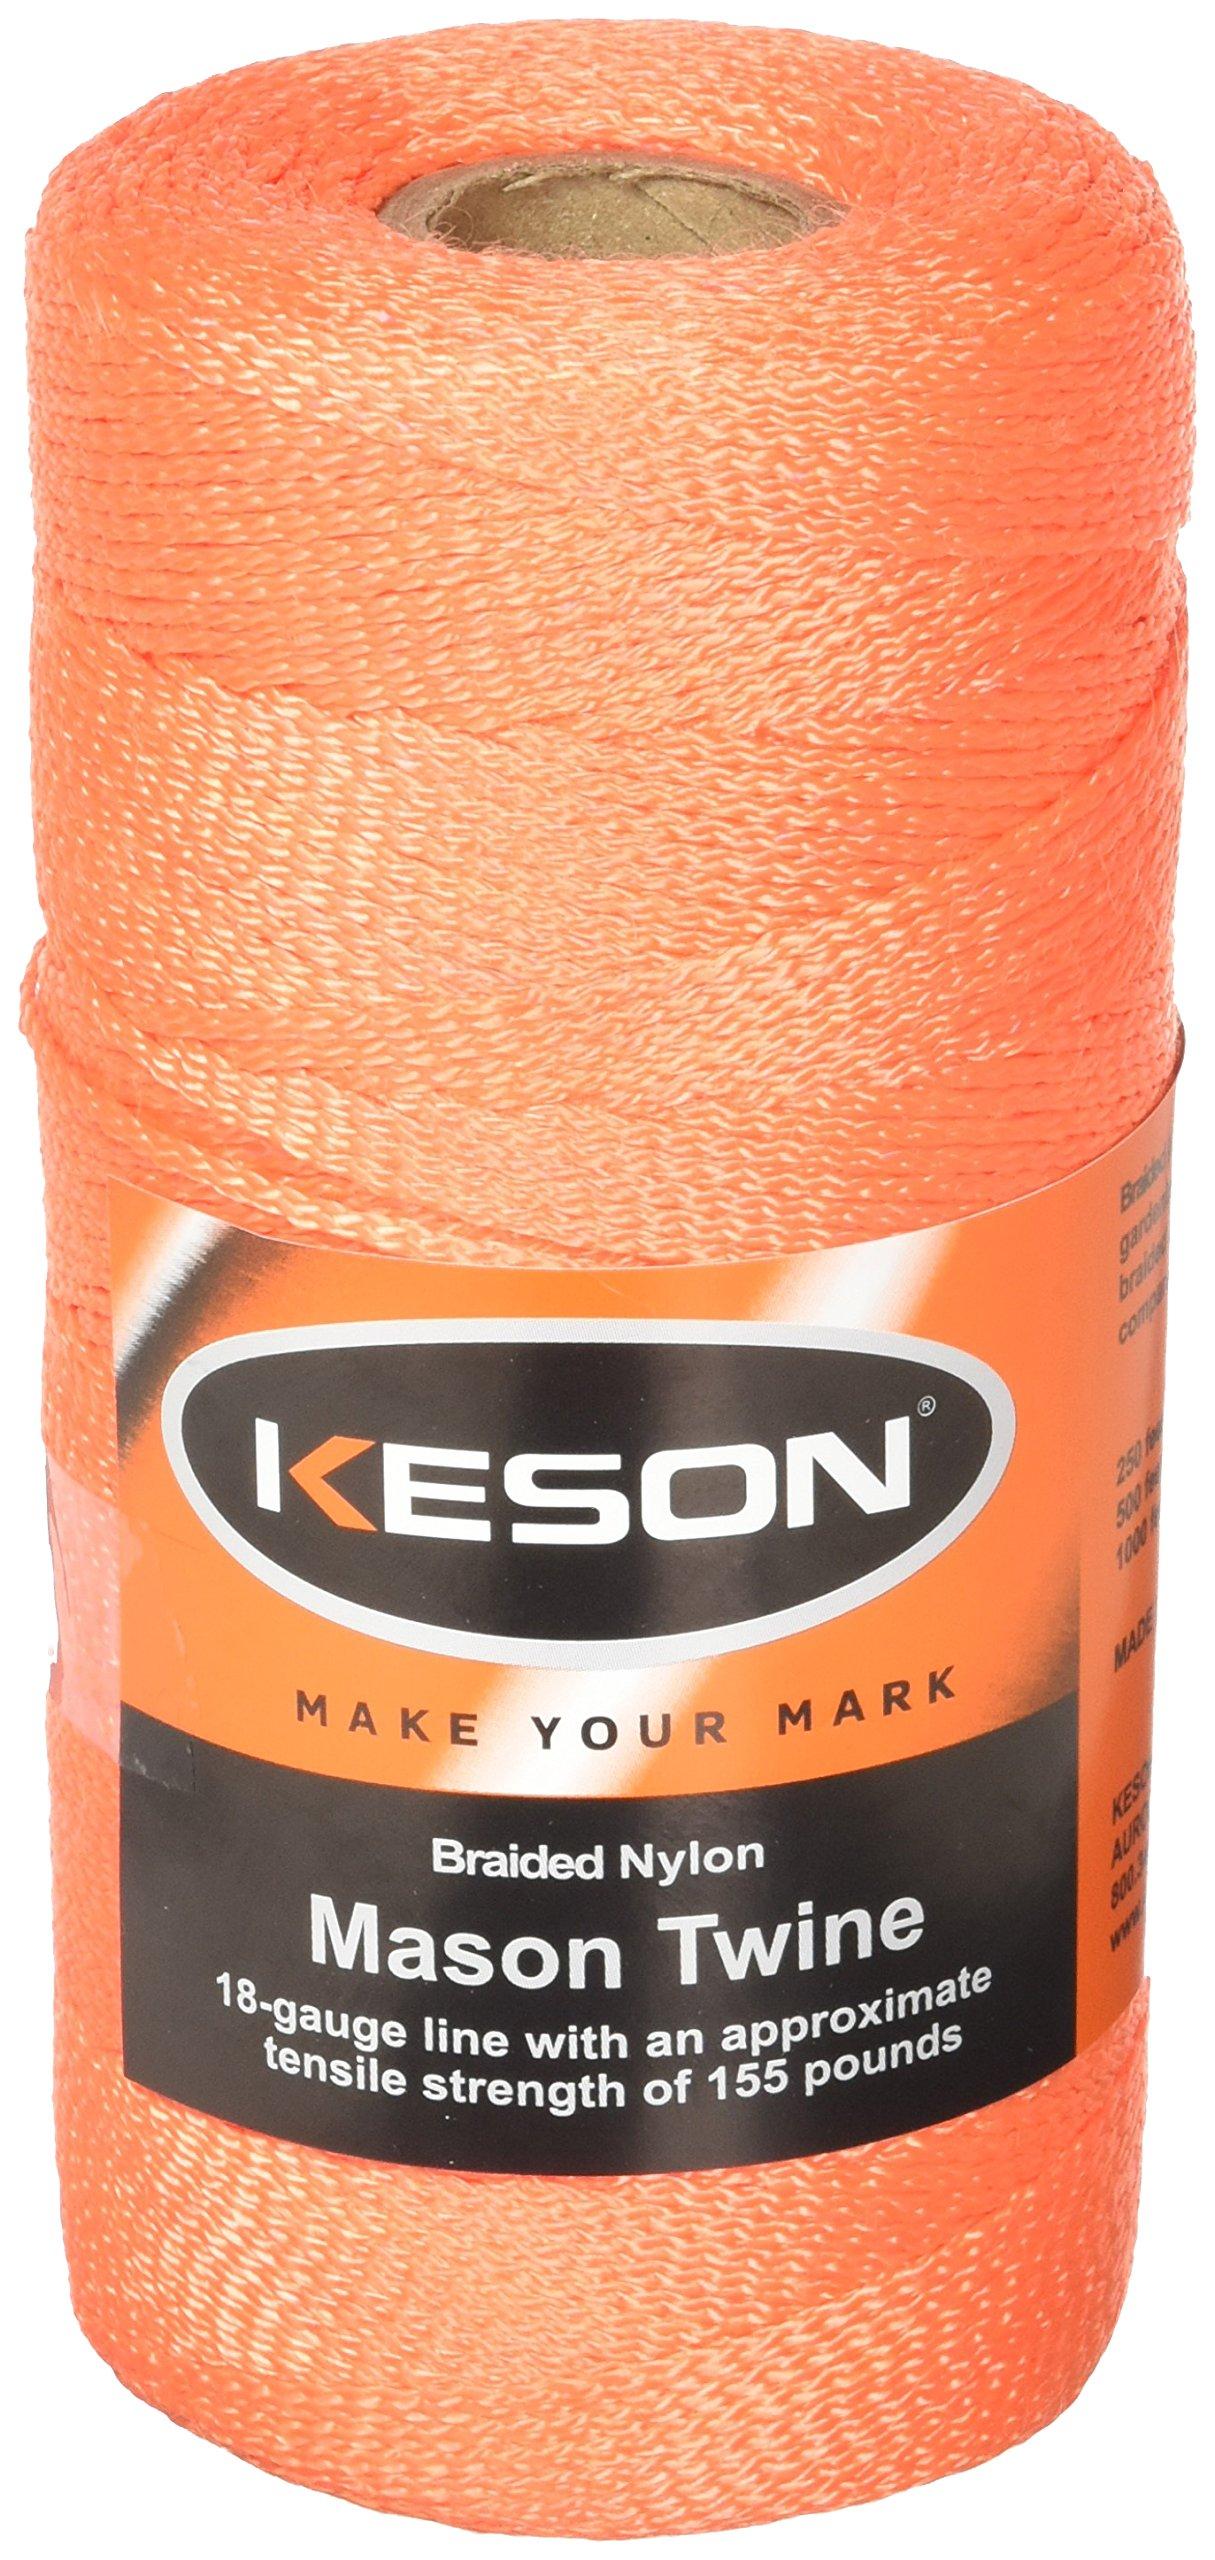 Keson OB1000 18 Gauge Braided Nylon Mason Twine, Orange, 1,000-Foot by Keson